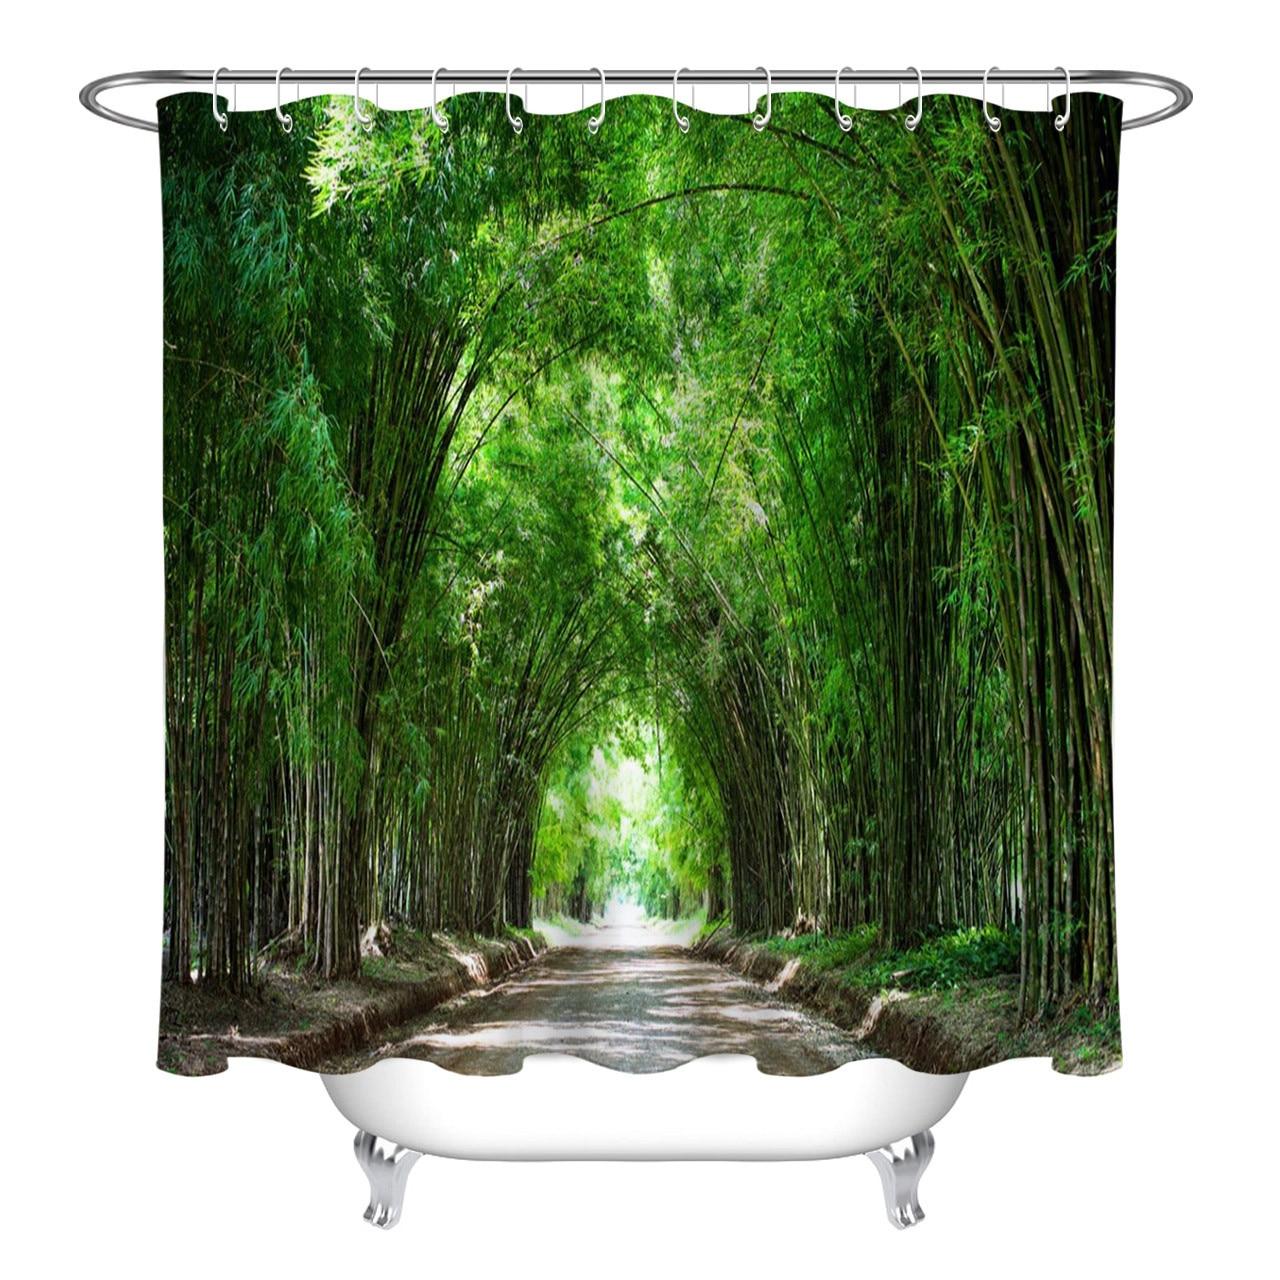 Home Garden Green Bamboo Forest View Shower Curtain